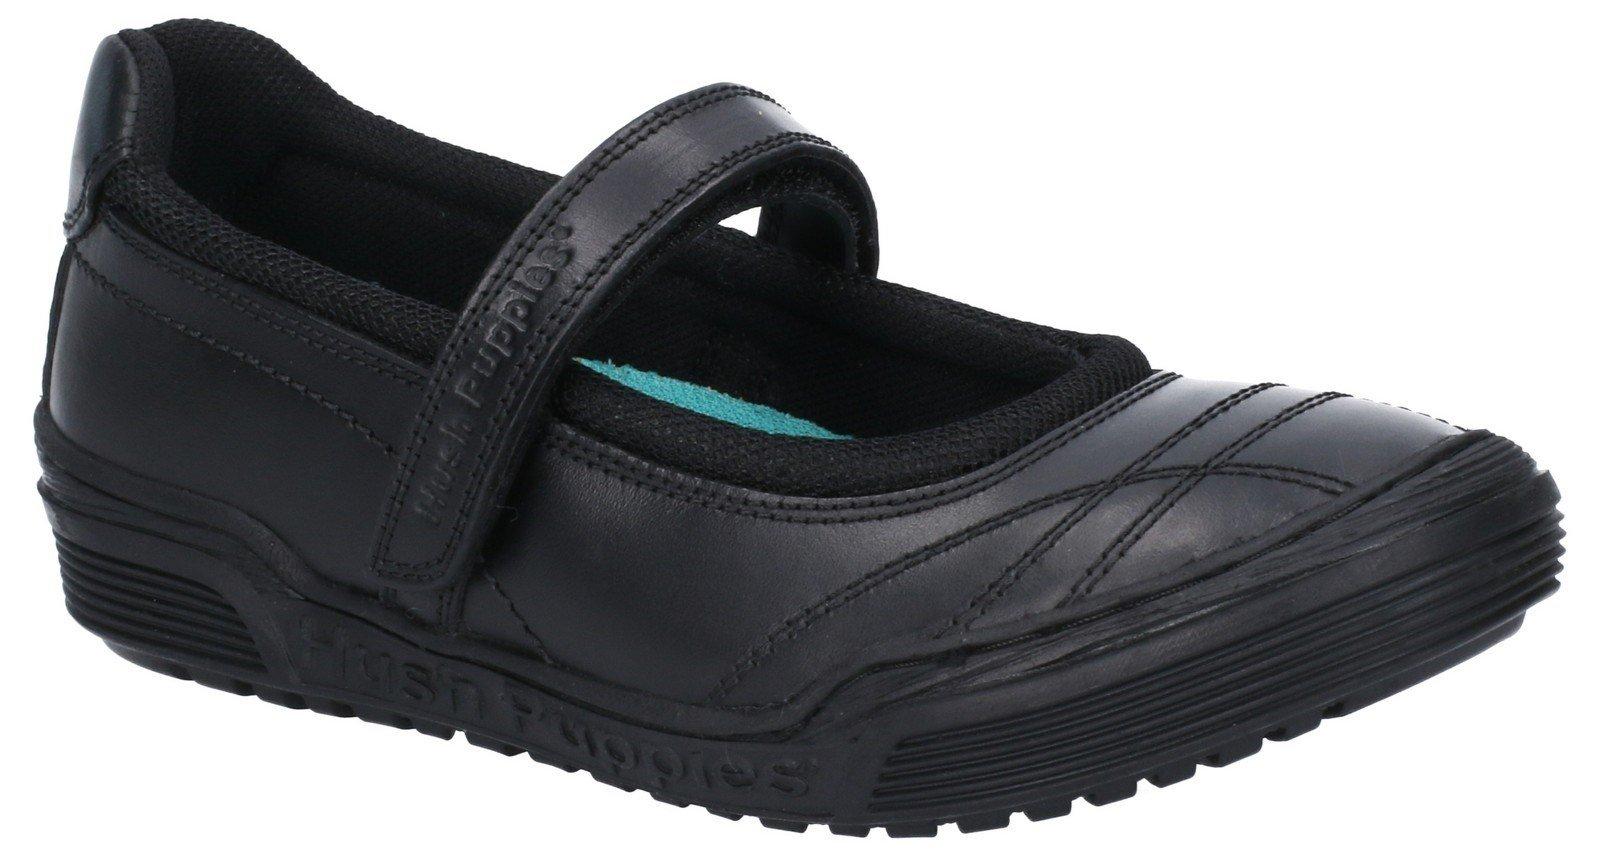 Hush Puppies Kid's Amelia Snr Touch Fastening School Shoe Black 28976 - Black 3 UK